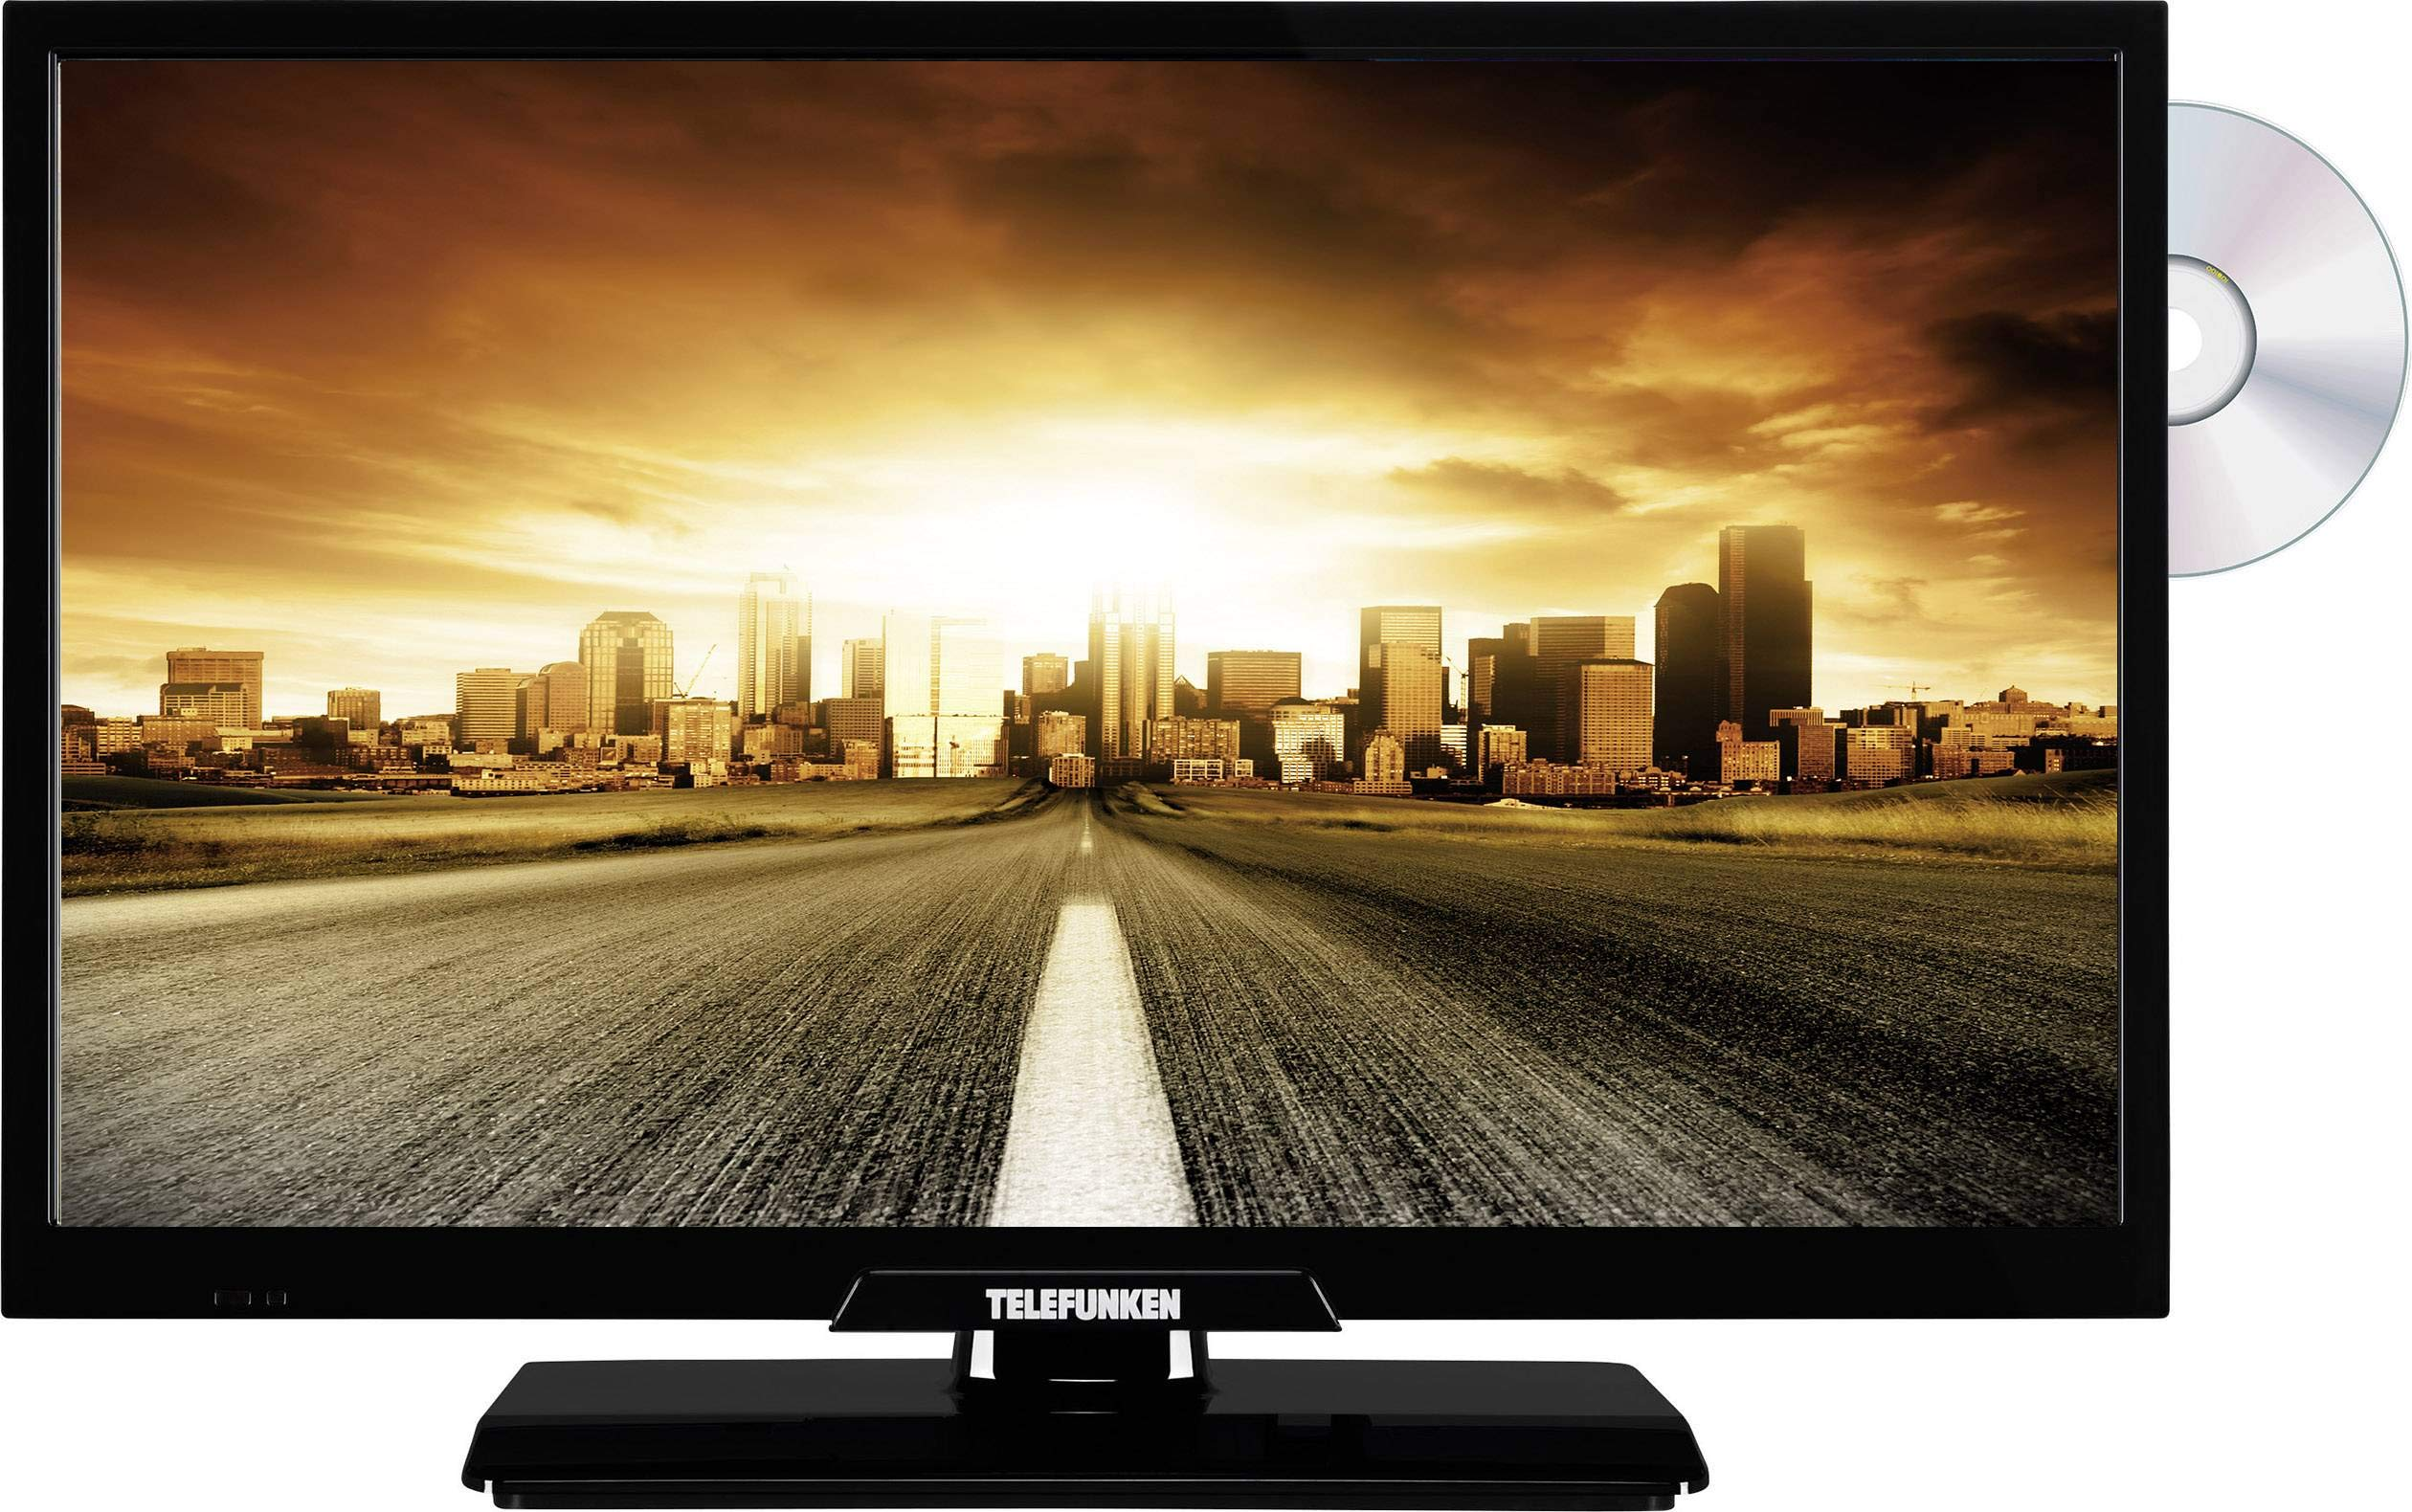 Telefunken D22F342A LED-TV 55cm 22 Zoll EEK A (A++: Amazon.es: Electrónica